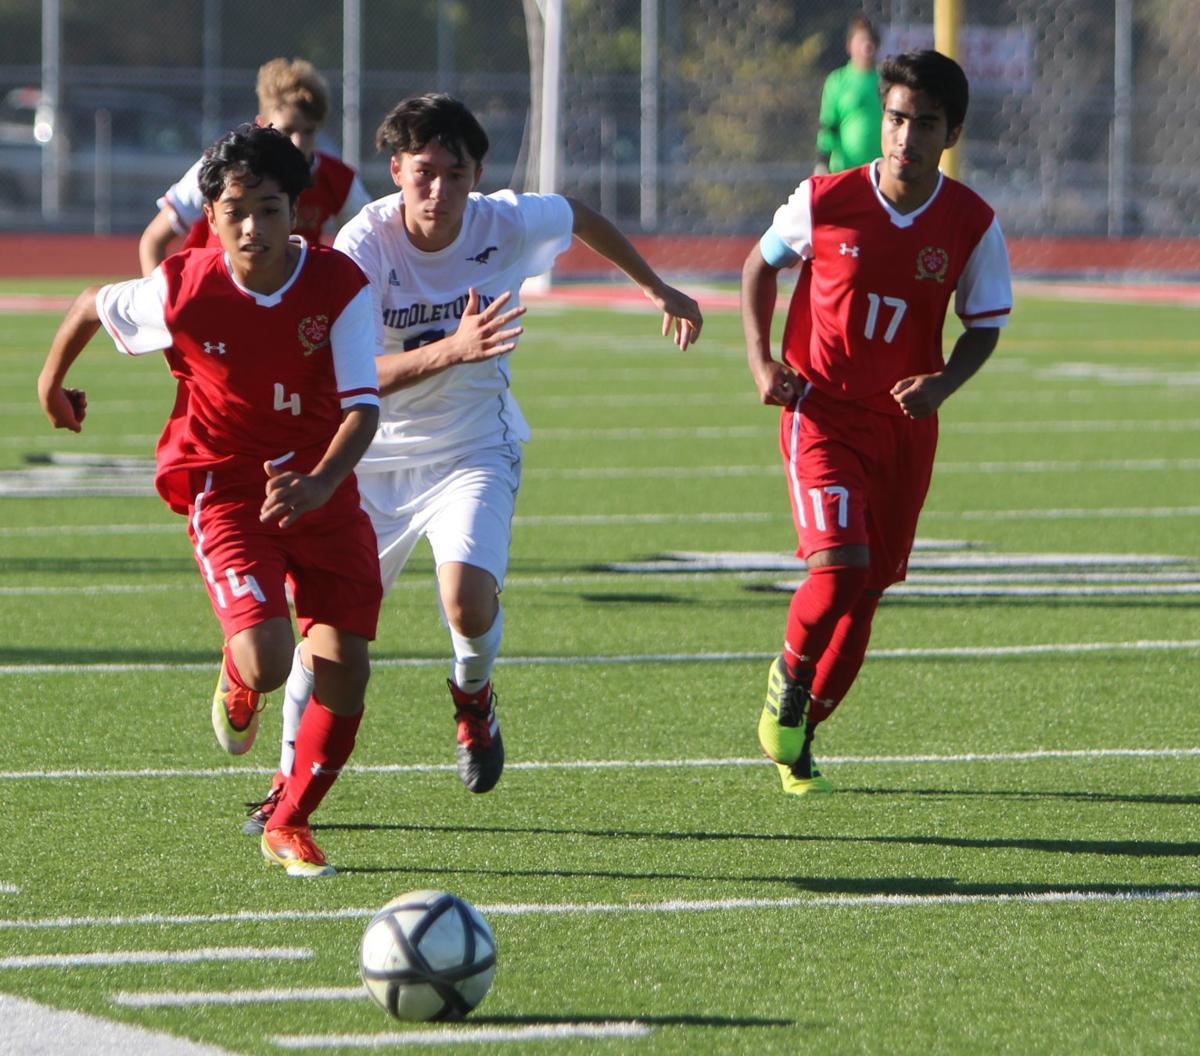 St. Helena boys soccer